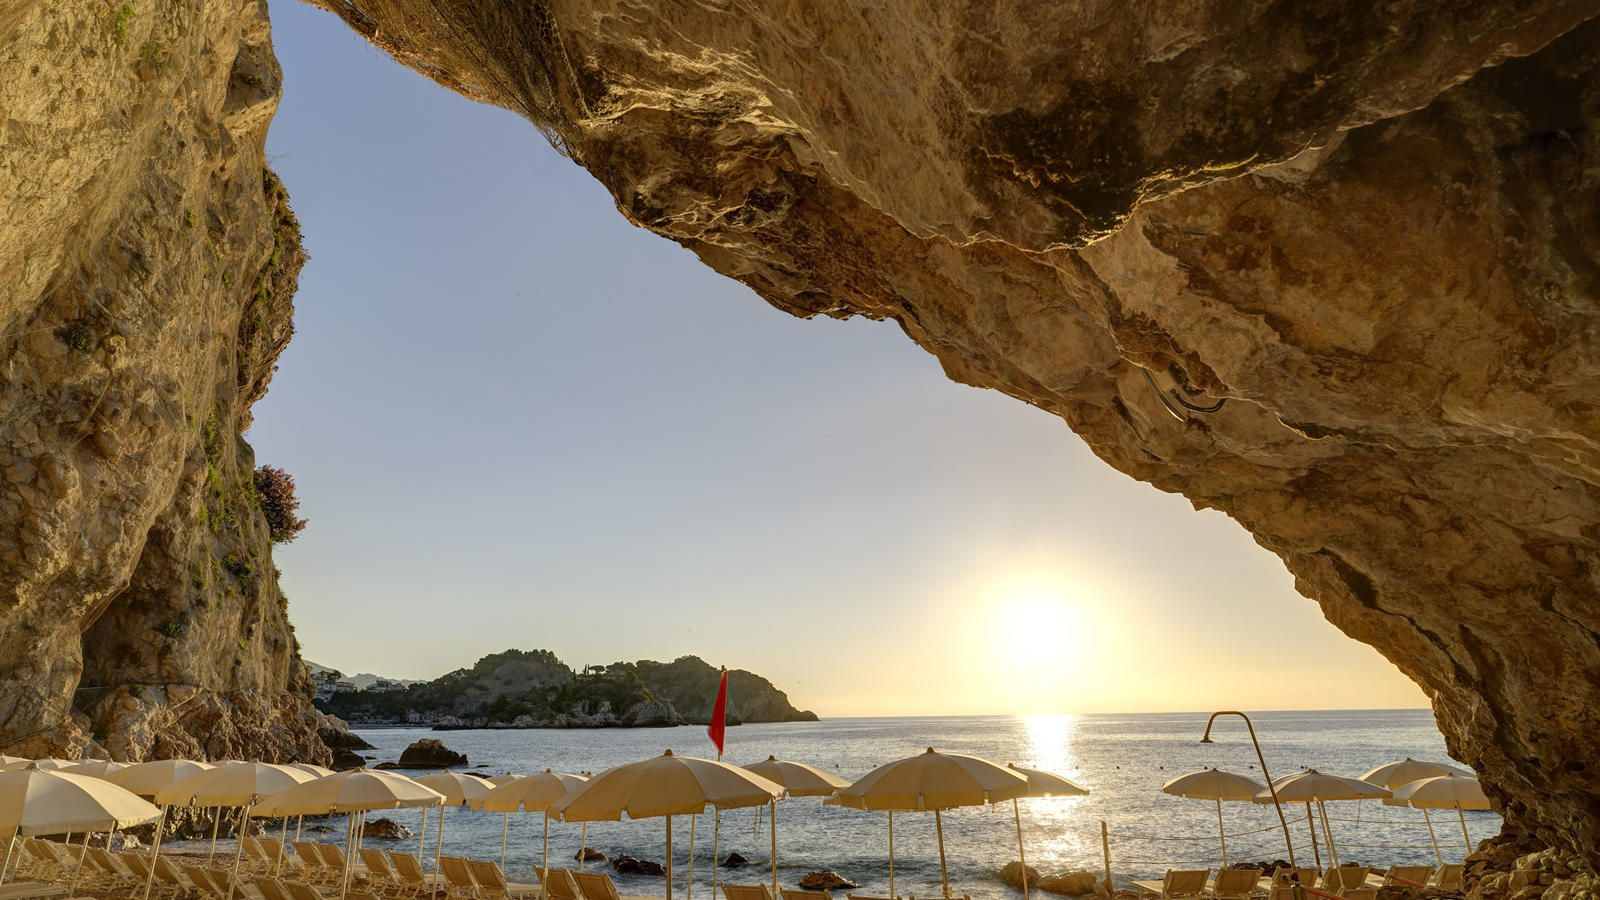 Unahotels Capotaormina Hotel sul mare a Taormina Sicilia